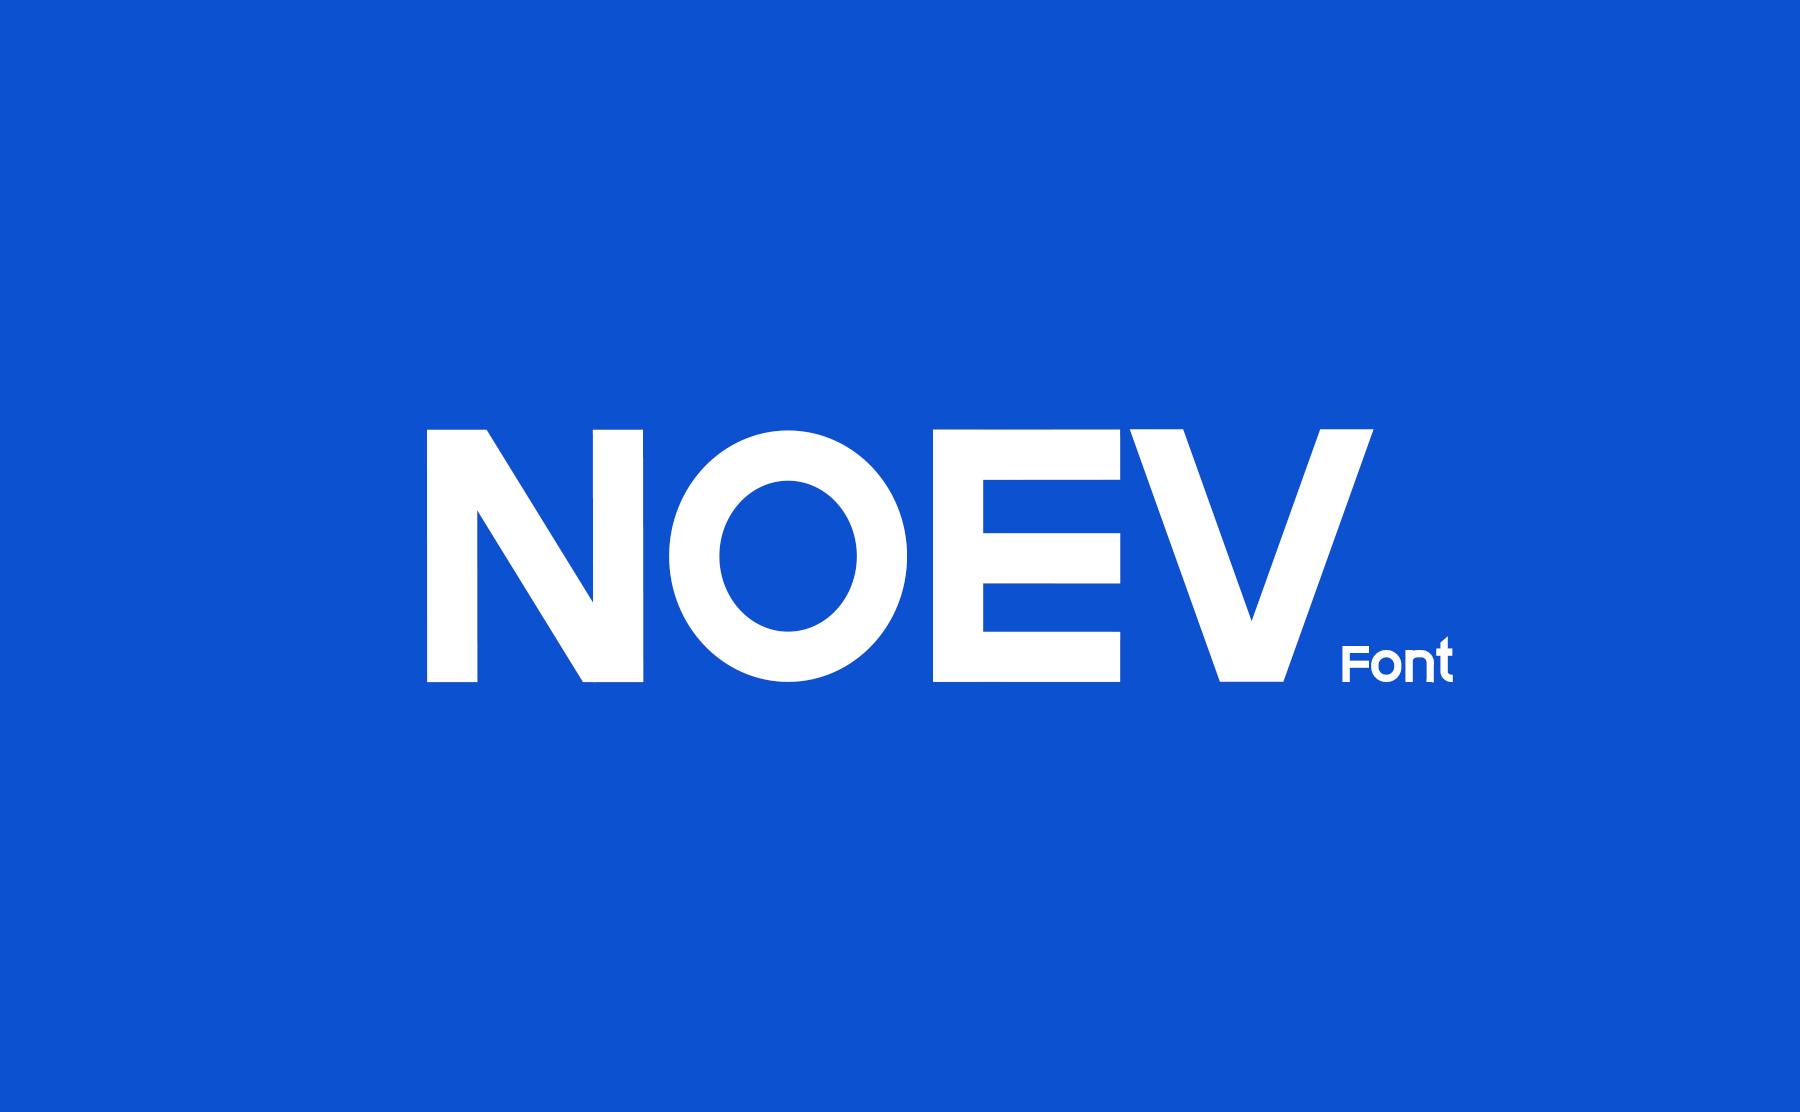 Noev-Font